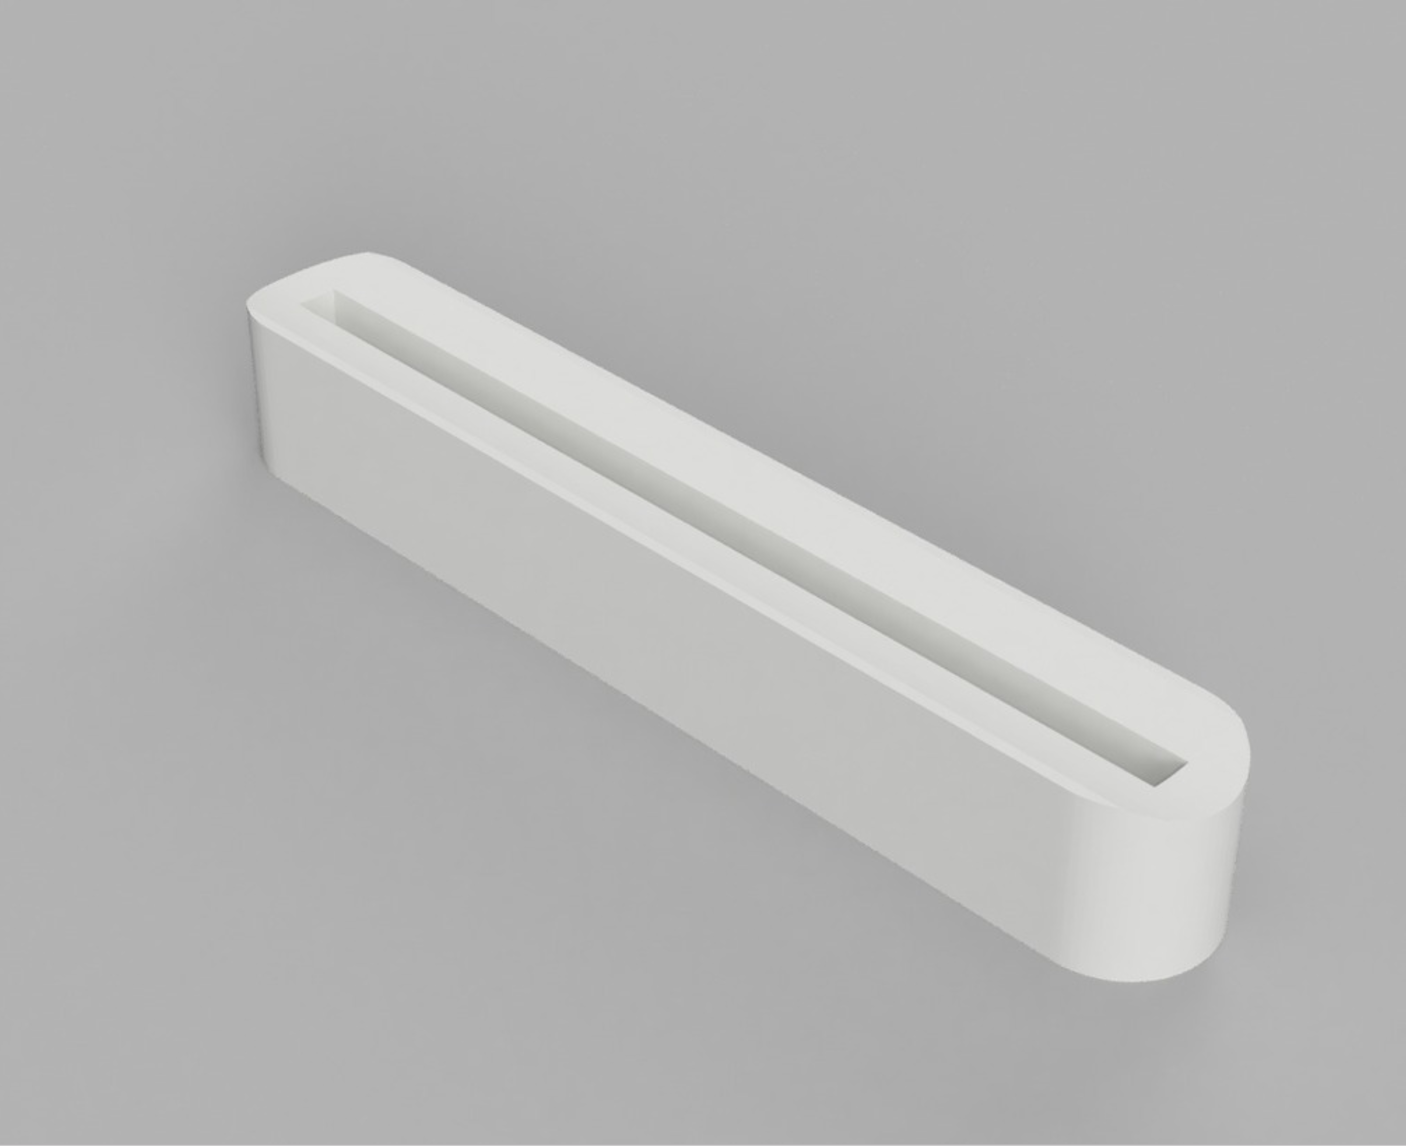 Capture d'écran 2017-07-31 à 16.08.46.png Download free STL file Tooth Paste Squeezer • 3D printer template, 3DPrintingGurus